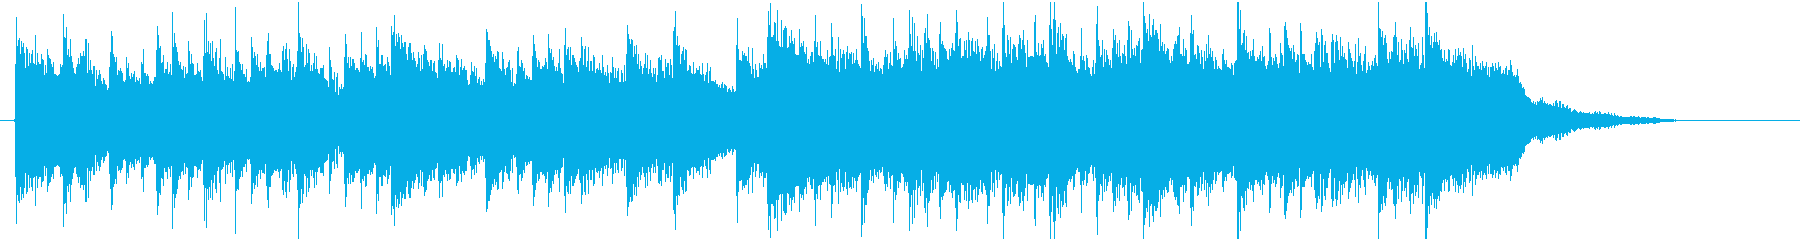 30s作品。ピアノを中心にしたオケもの。の再生済みの波形